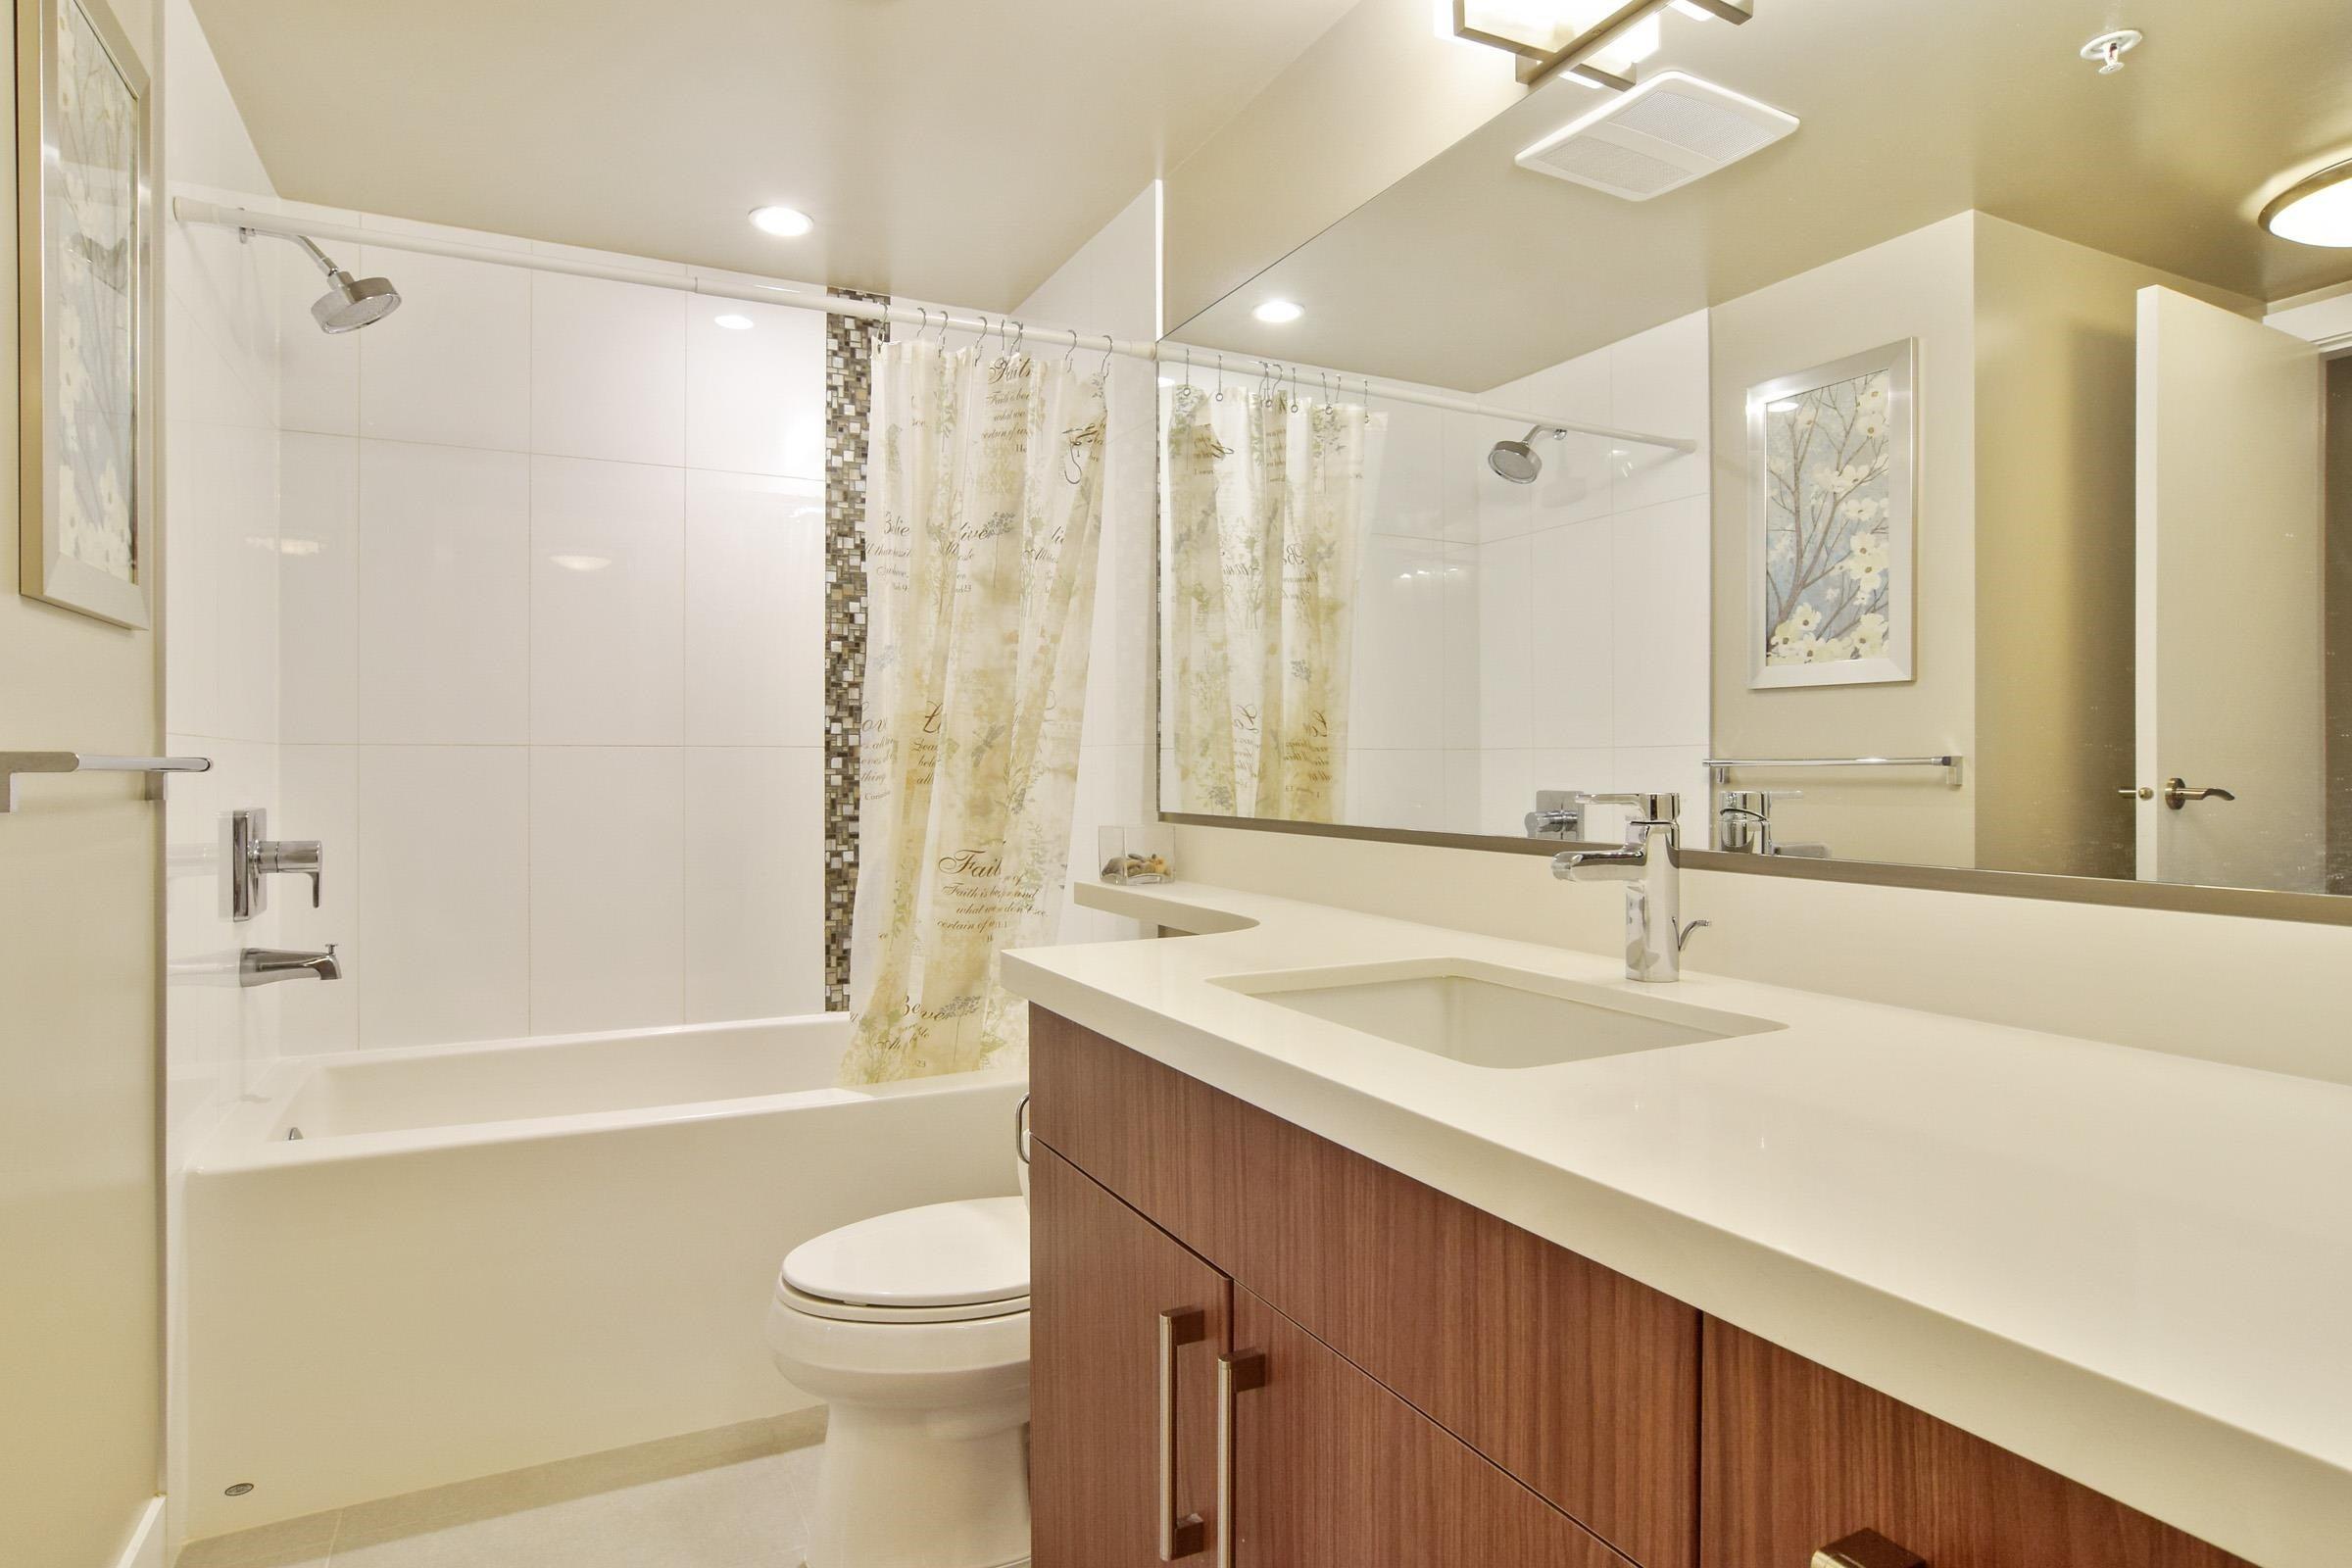 301 7131 STRIDE AVENUE - Edmonds BE Apartment/Condo for sale, 1 Bedroom (R2625669) - #13